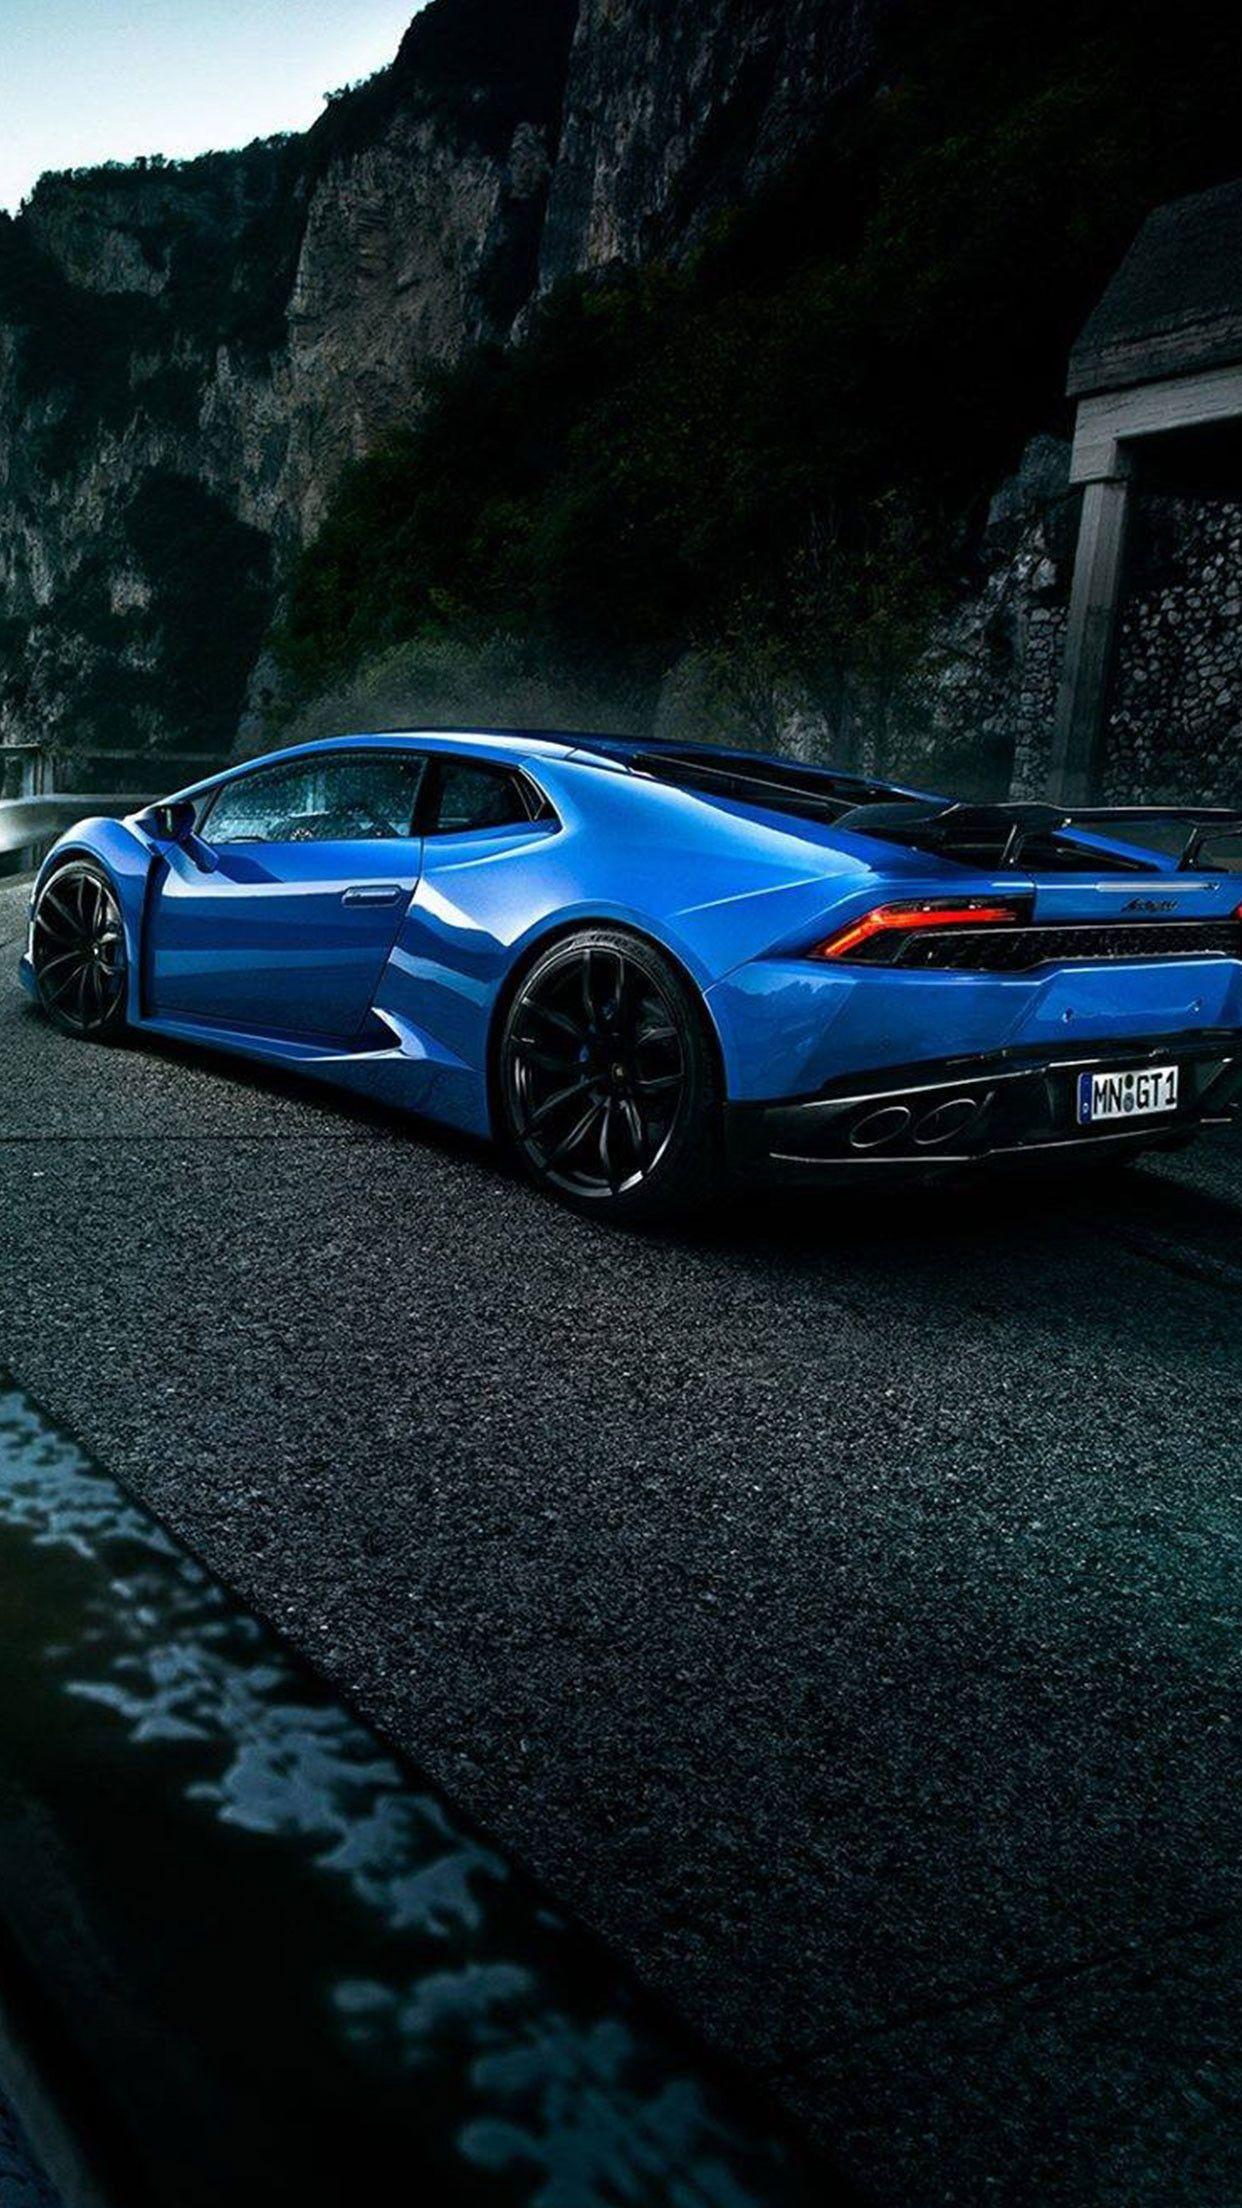 Sports Car Wallpaper Hd For Android 3d Wallpapers Blue Lamborghini